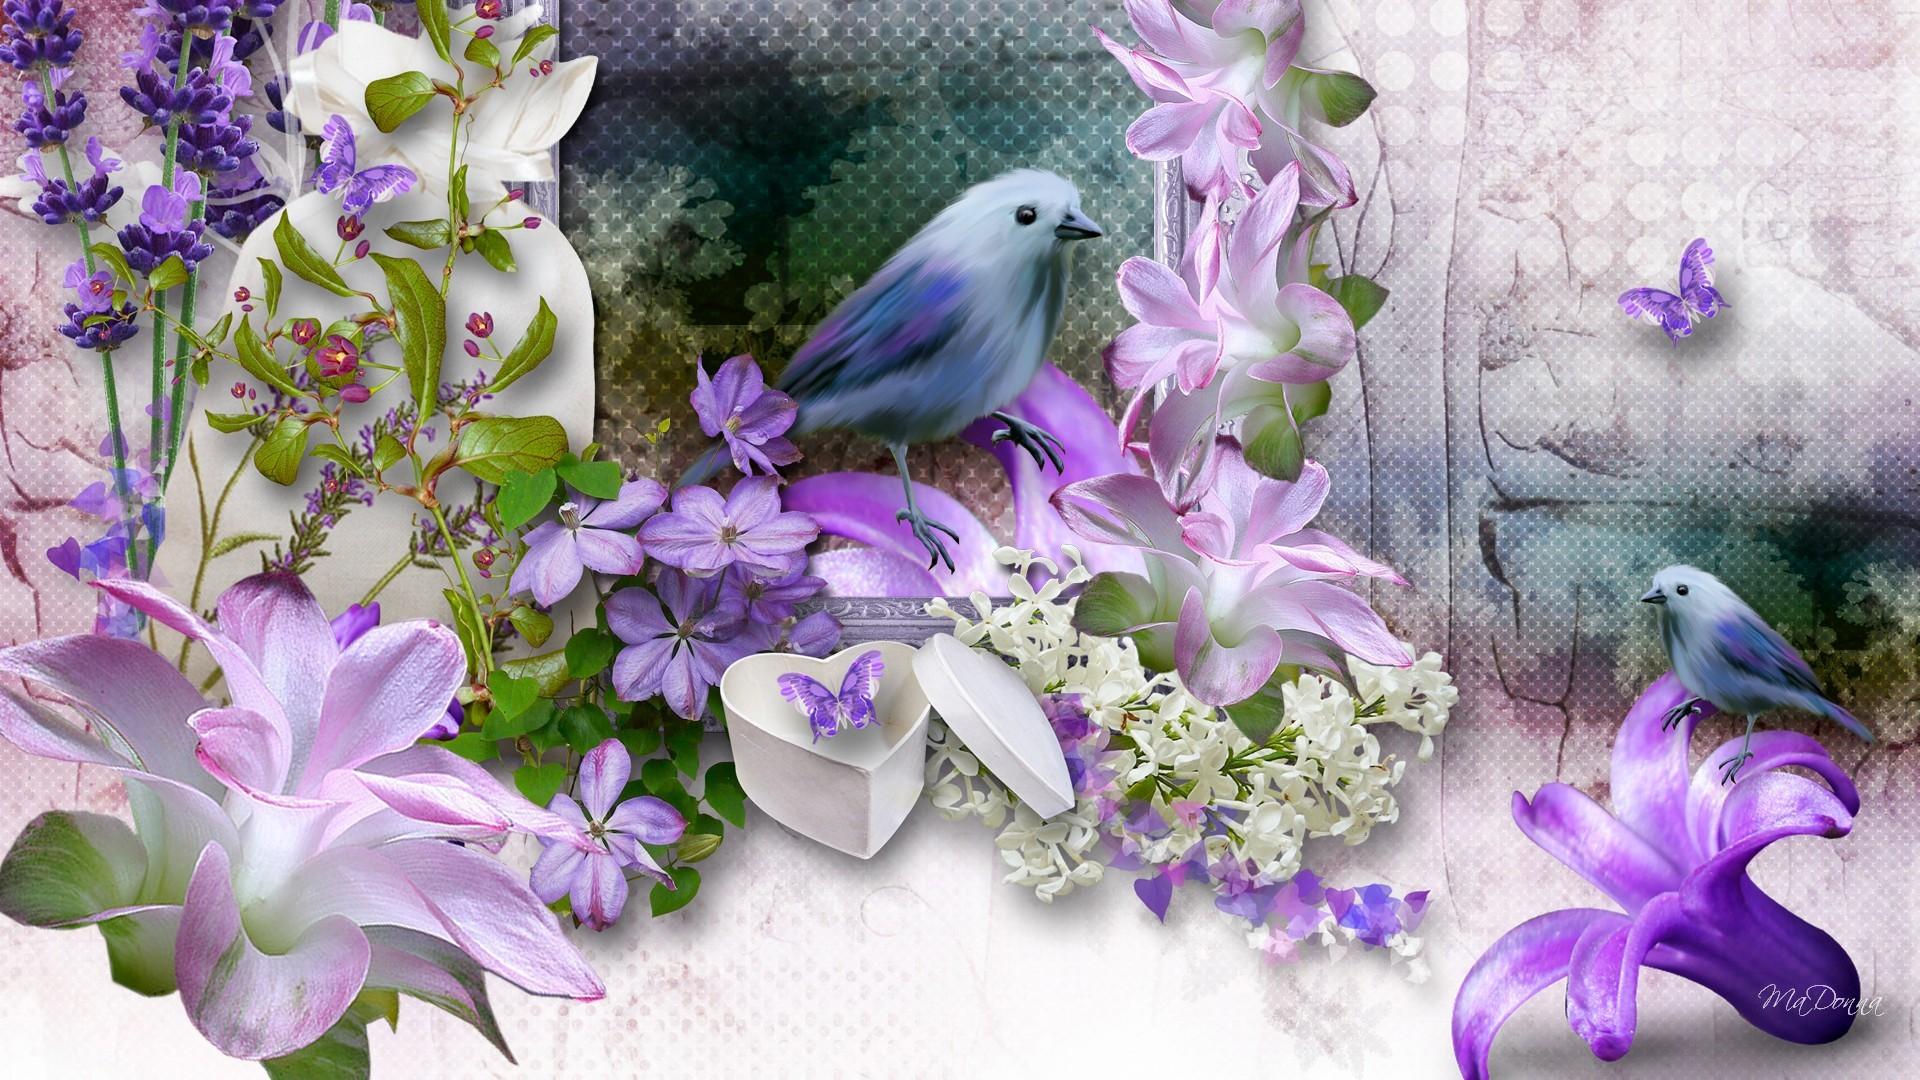 Summer Purple Flowers Lovely Lilies Firefox Bird Butterflies - 3d Laptop Wallpaper Scenery , HD Wallpaper & Backgrounds